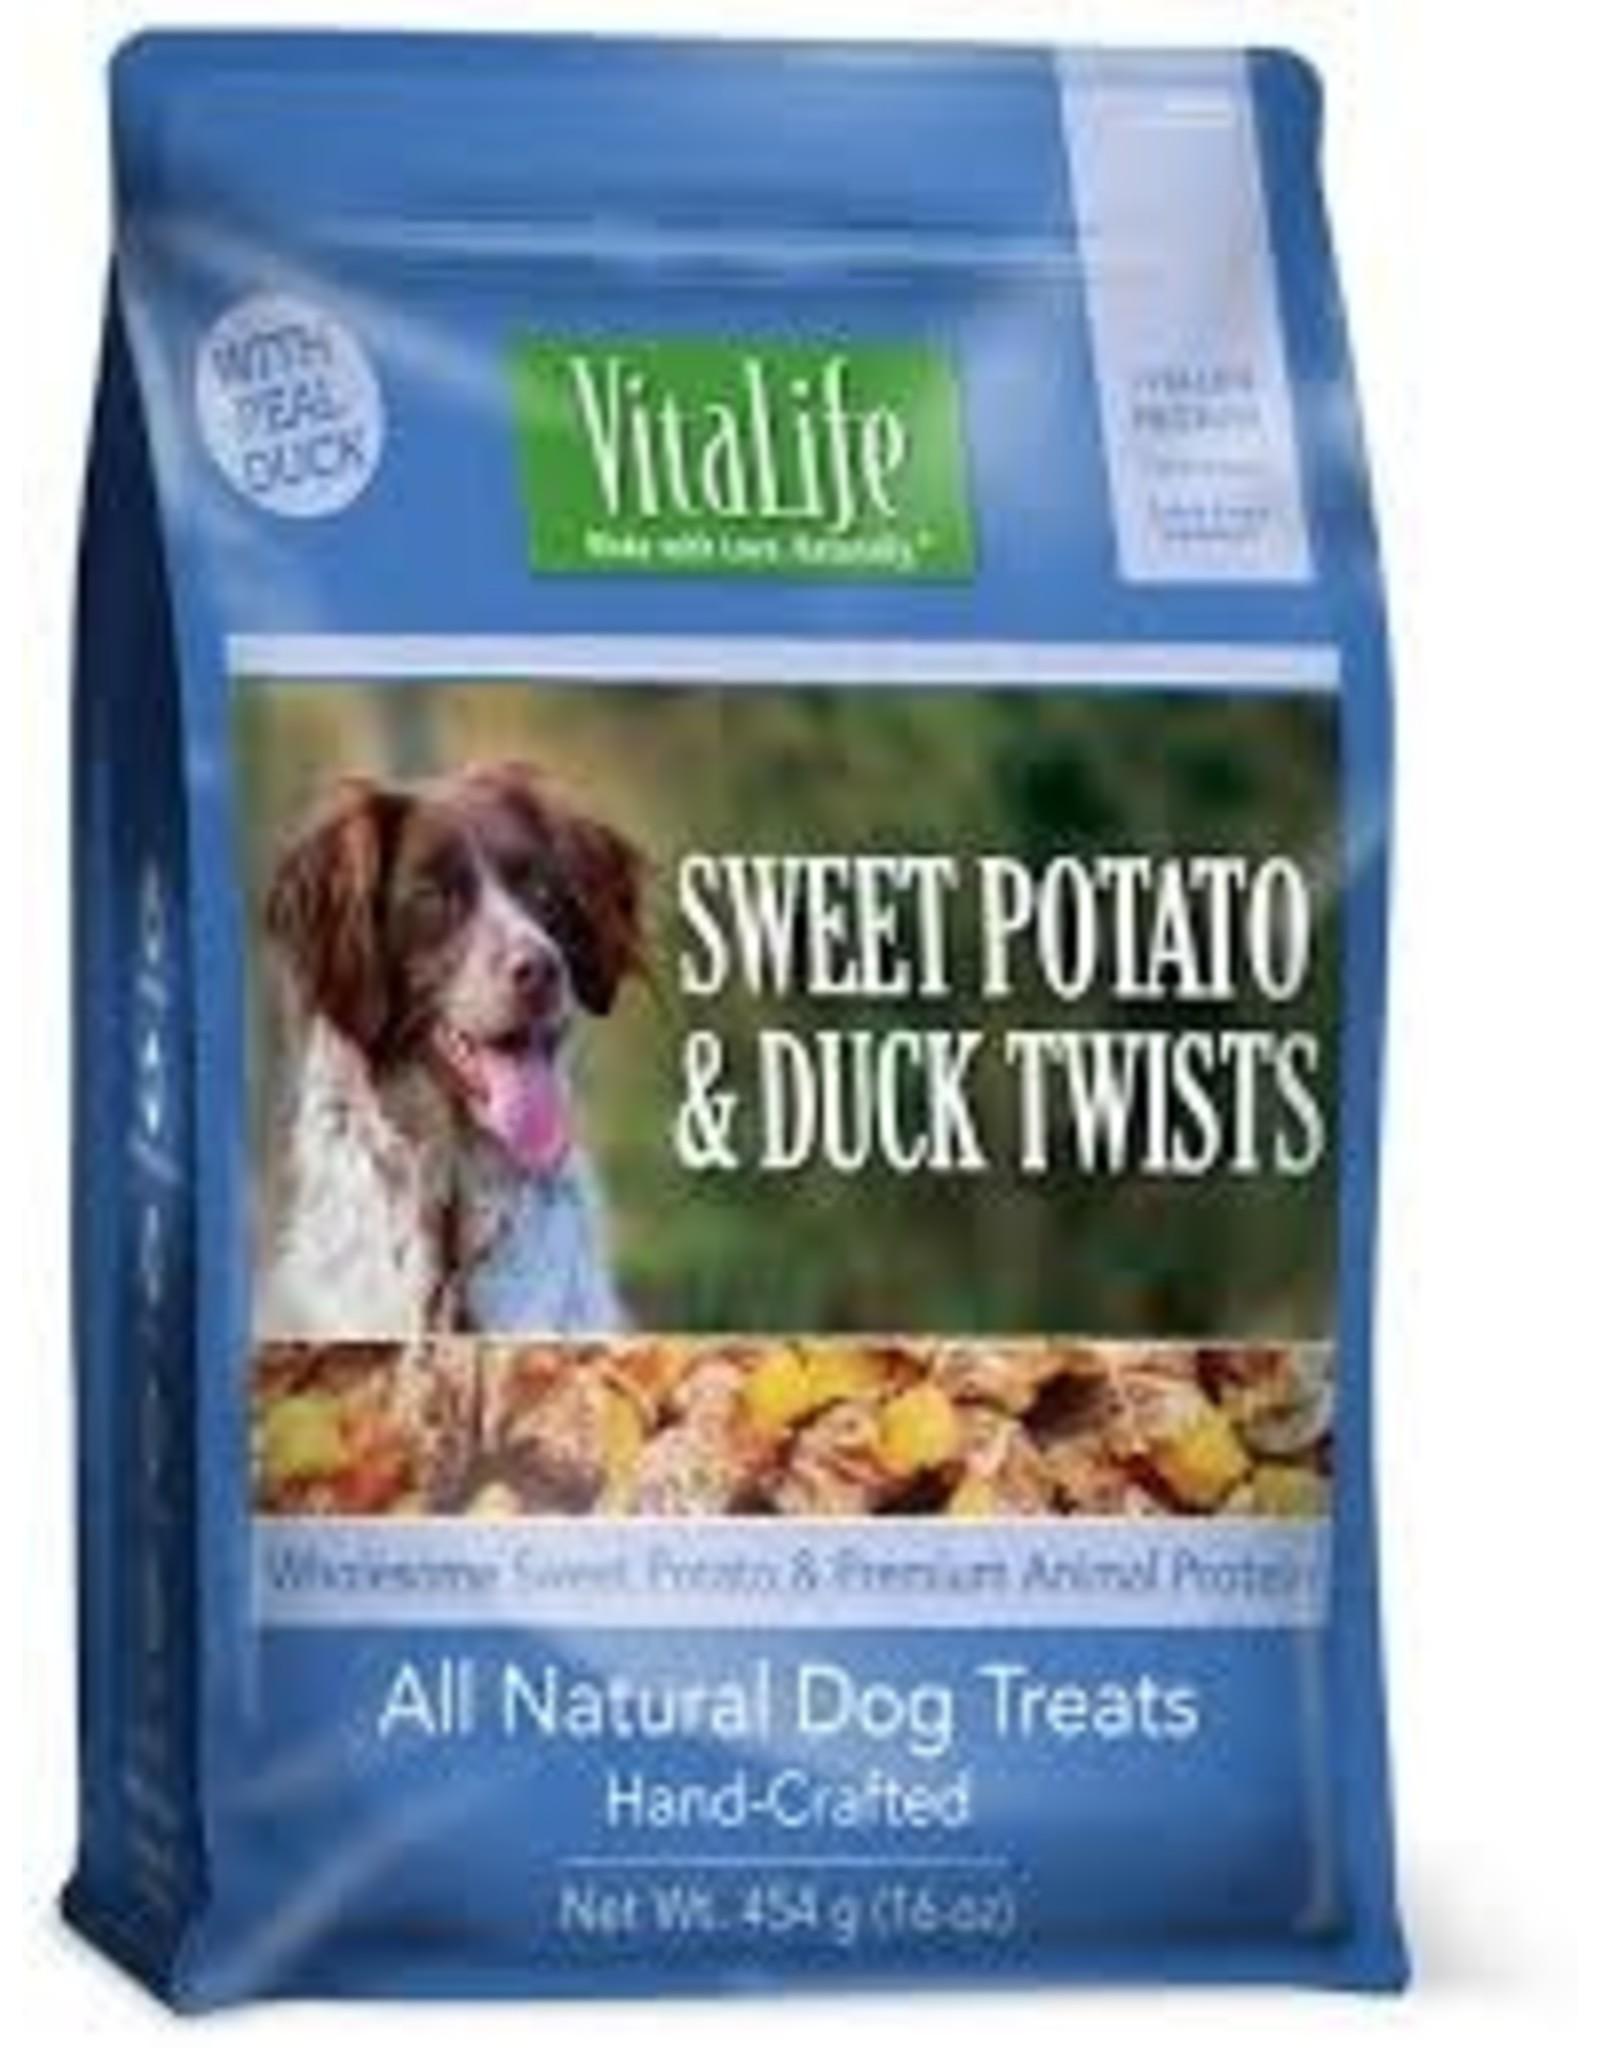 VitaLife Vitalife - Sweet Potato & Duck 200g